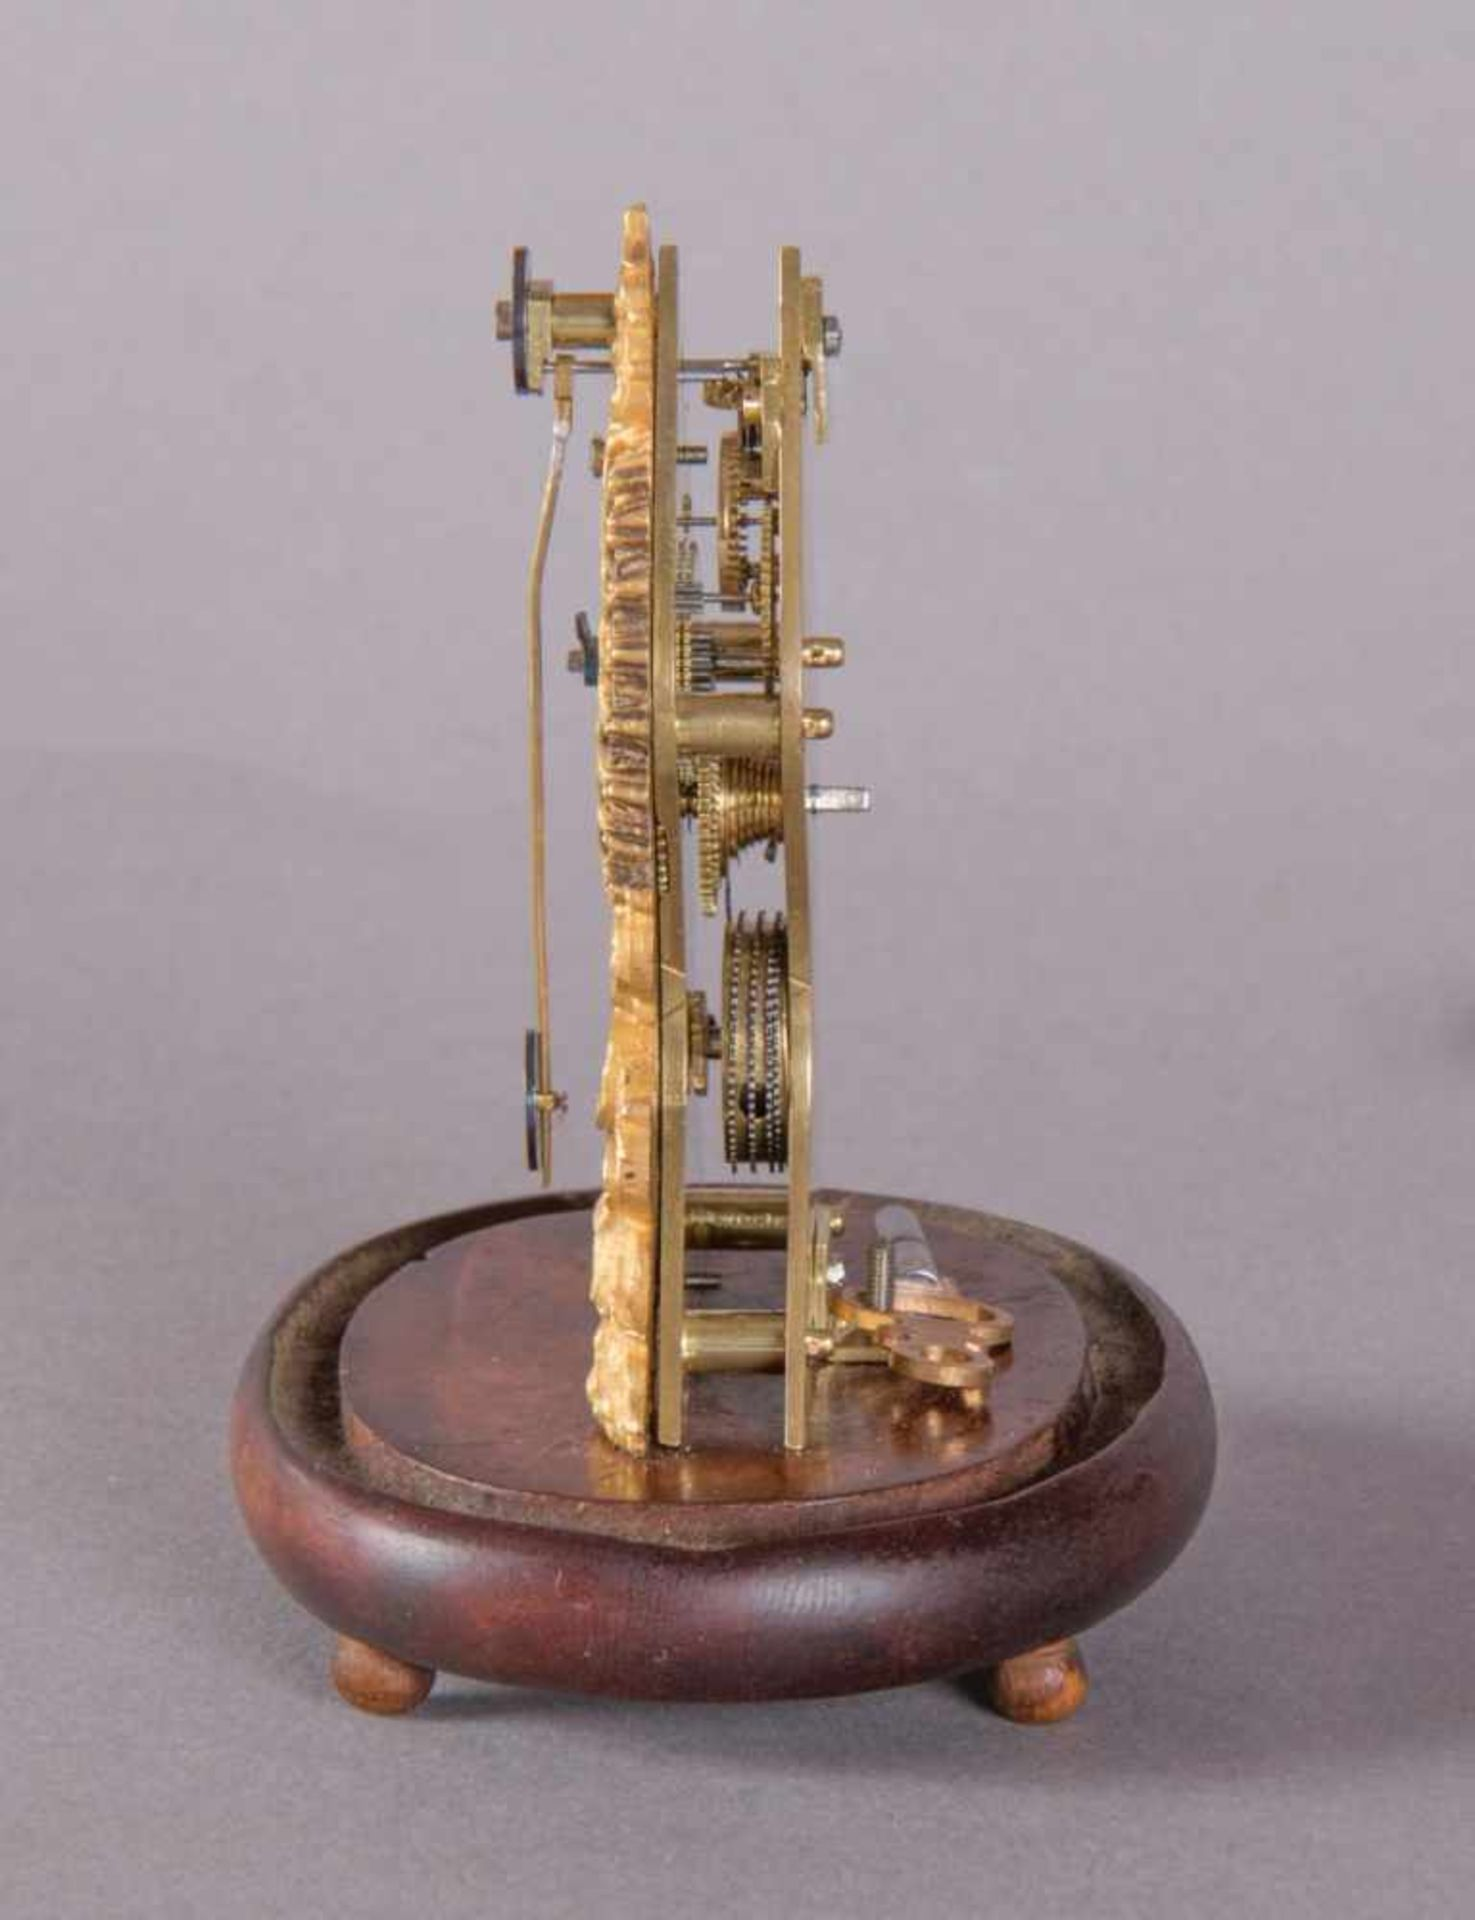 Los 70 - fire-gilded fidgetFidget Clockaround 1830 H 9.5 cm x W 8 x D 6.5 cm fire-gilded and cast case,